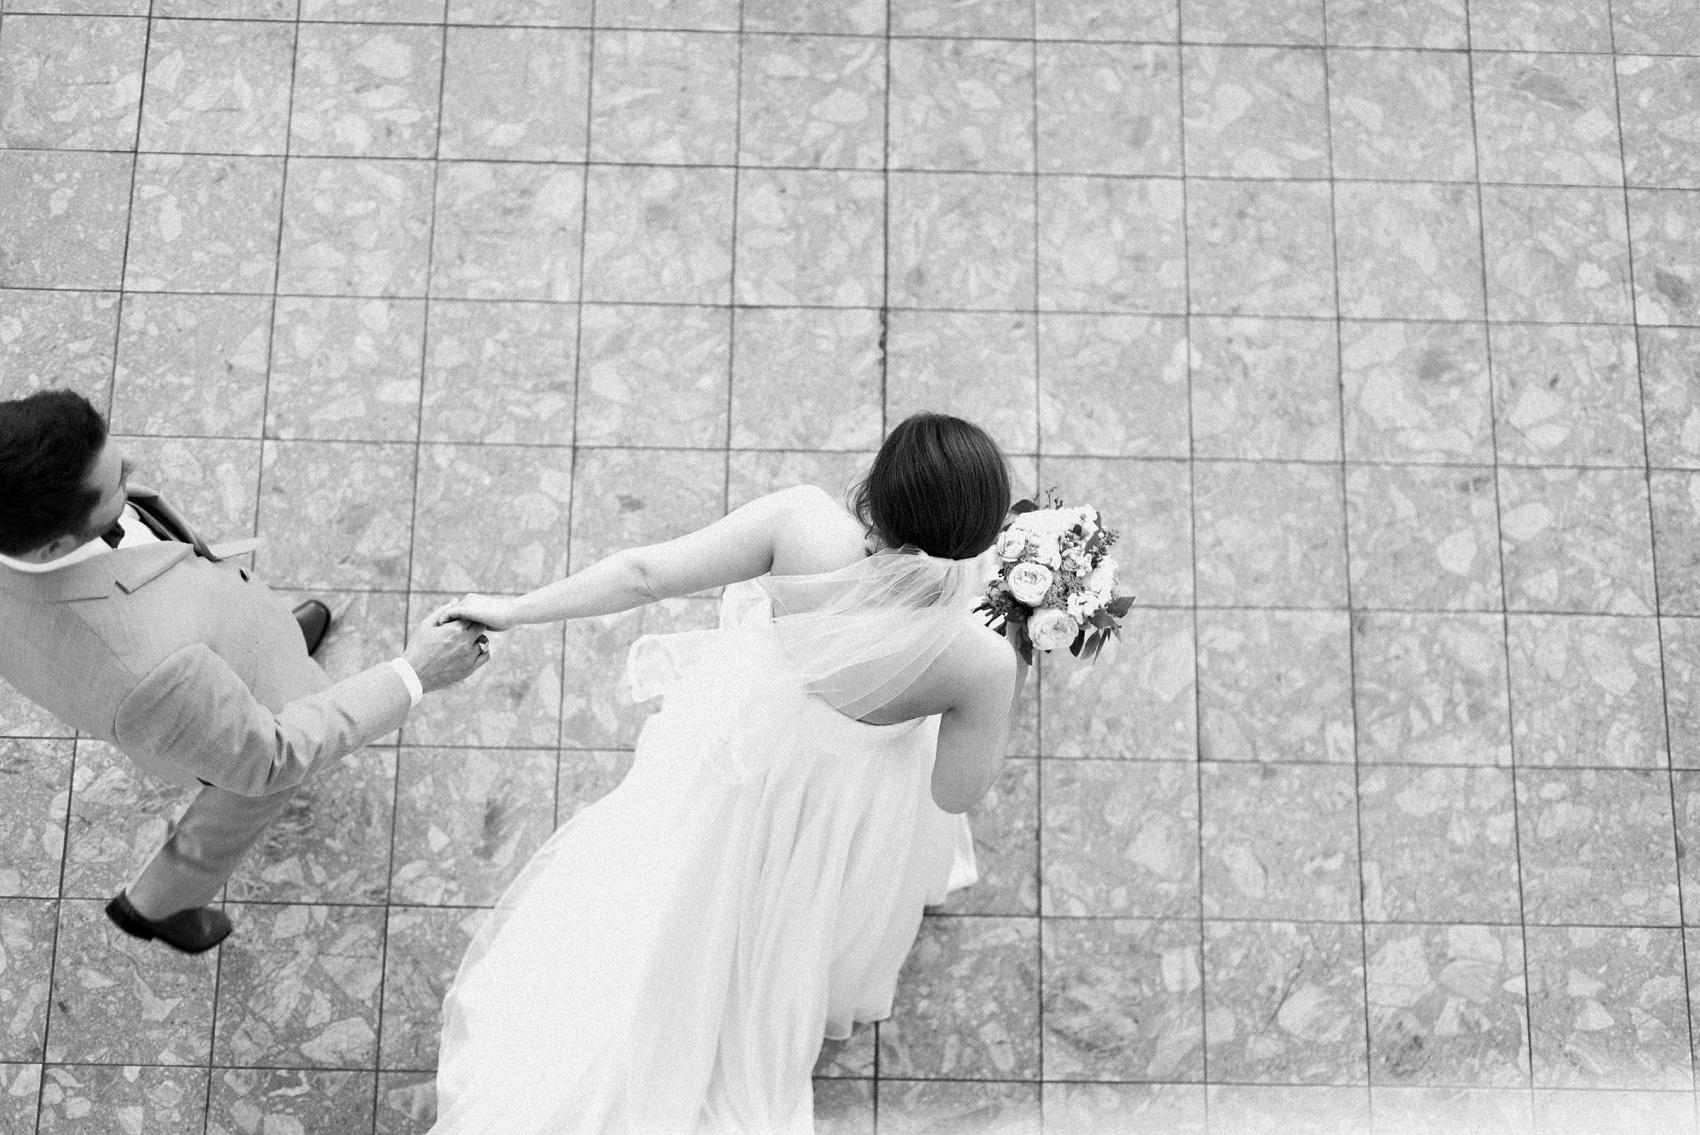 sc_wedding_photographer_2845.jpg